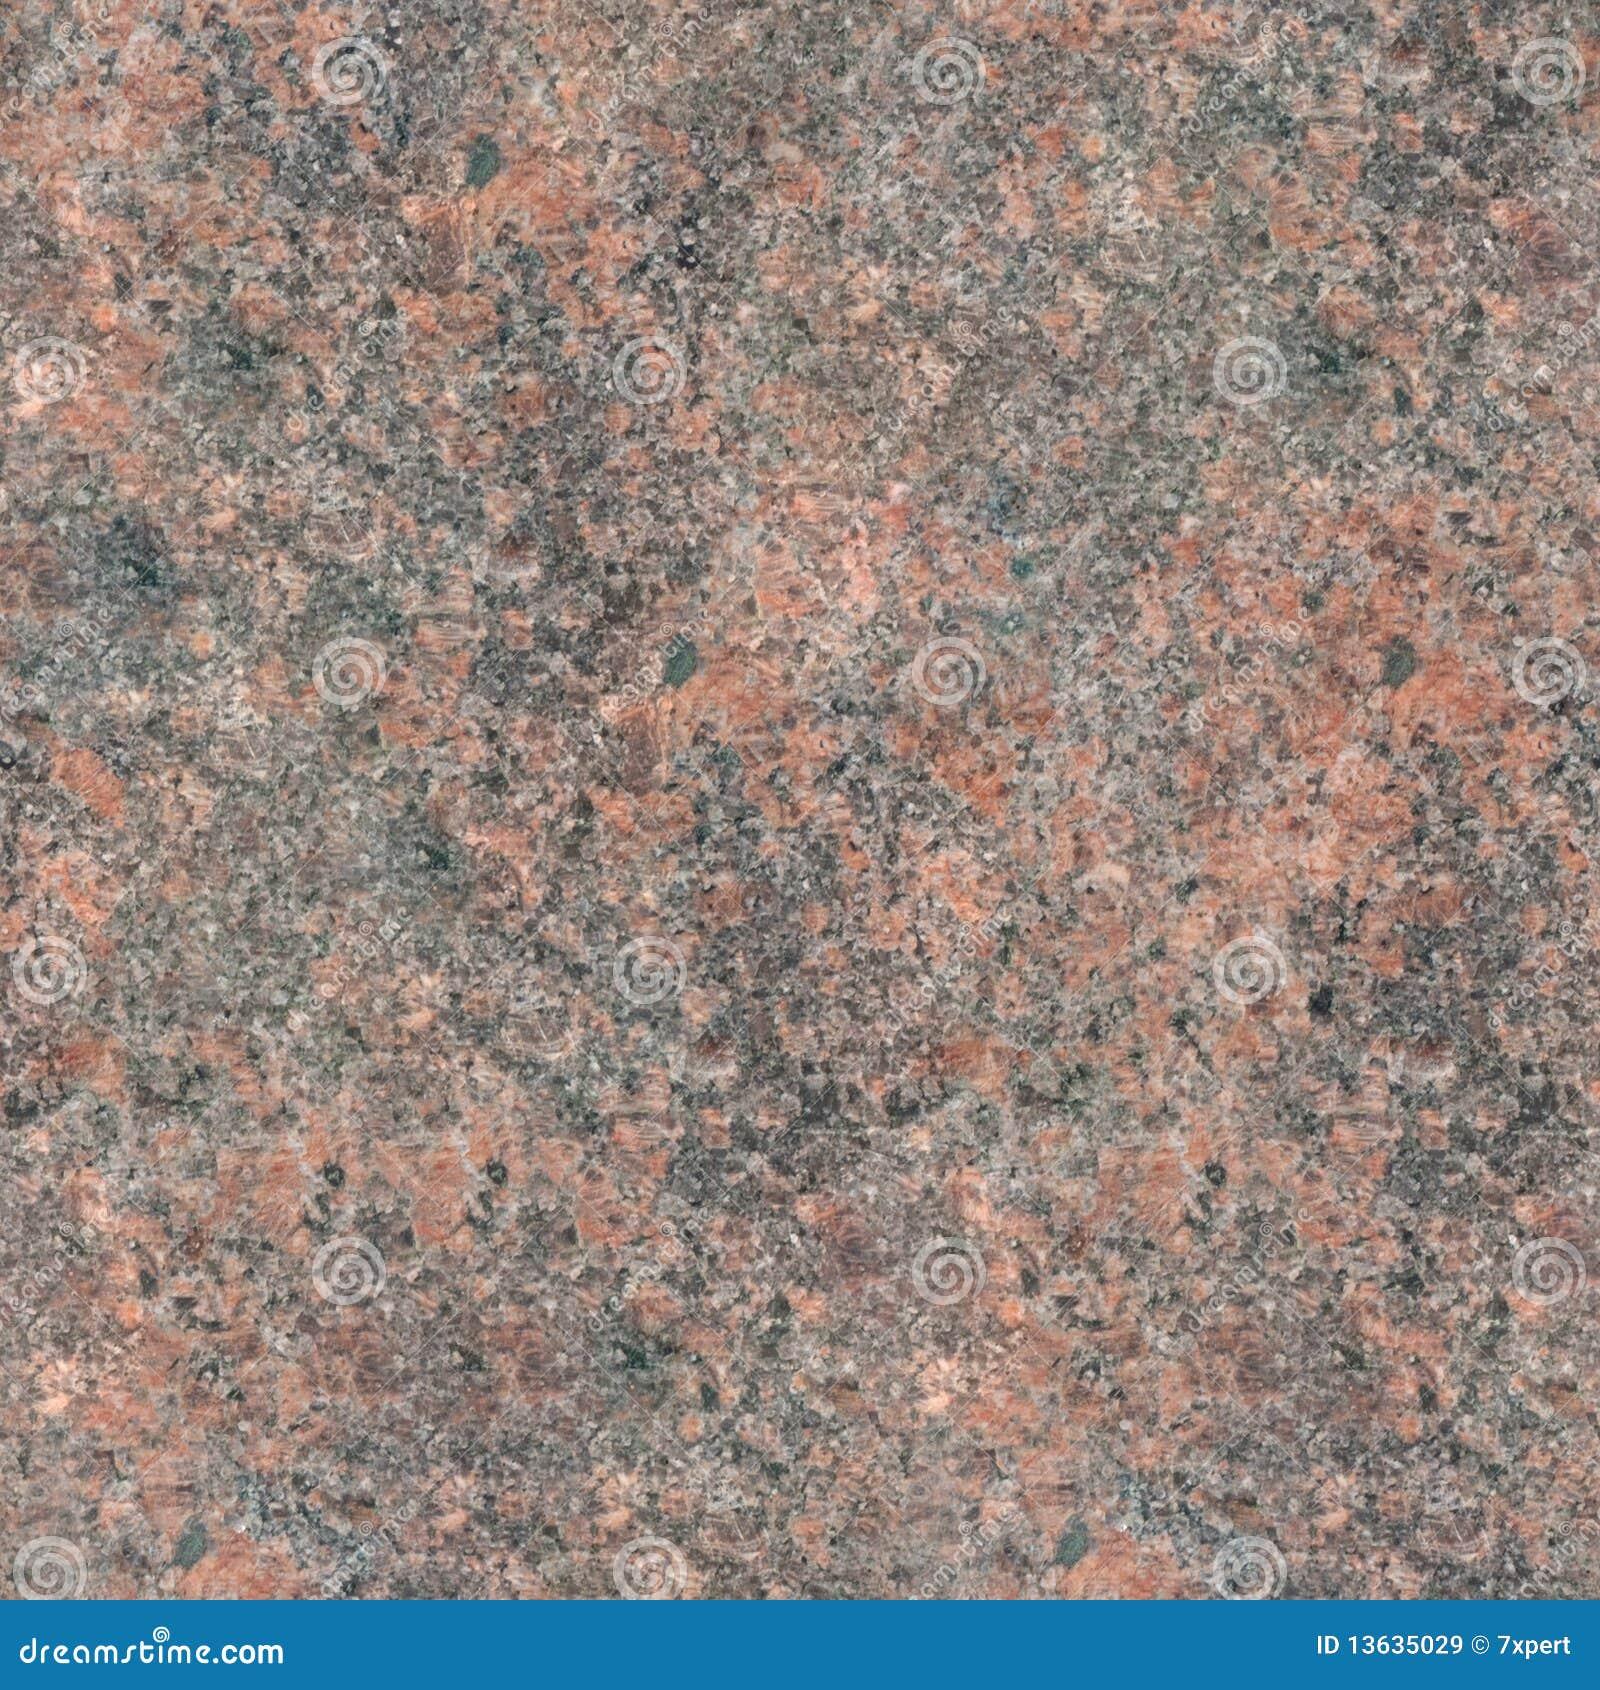 Seamless Granite Texture Royalty Free Stock Images - Image ... Polished Granite Texture Seamless